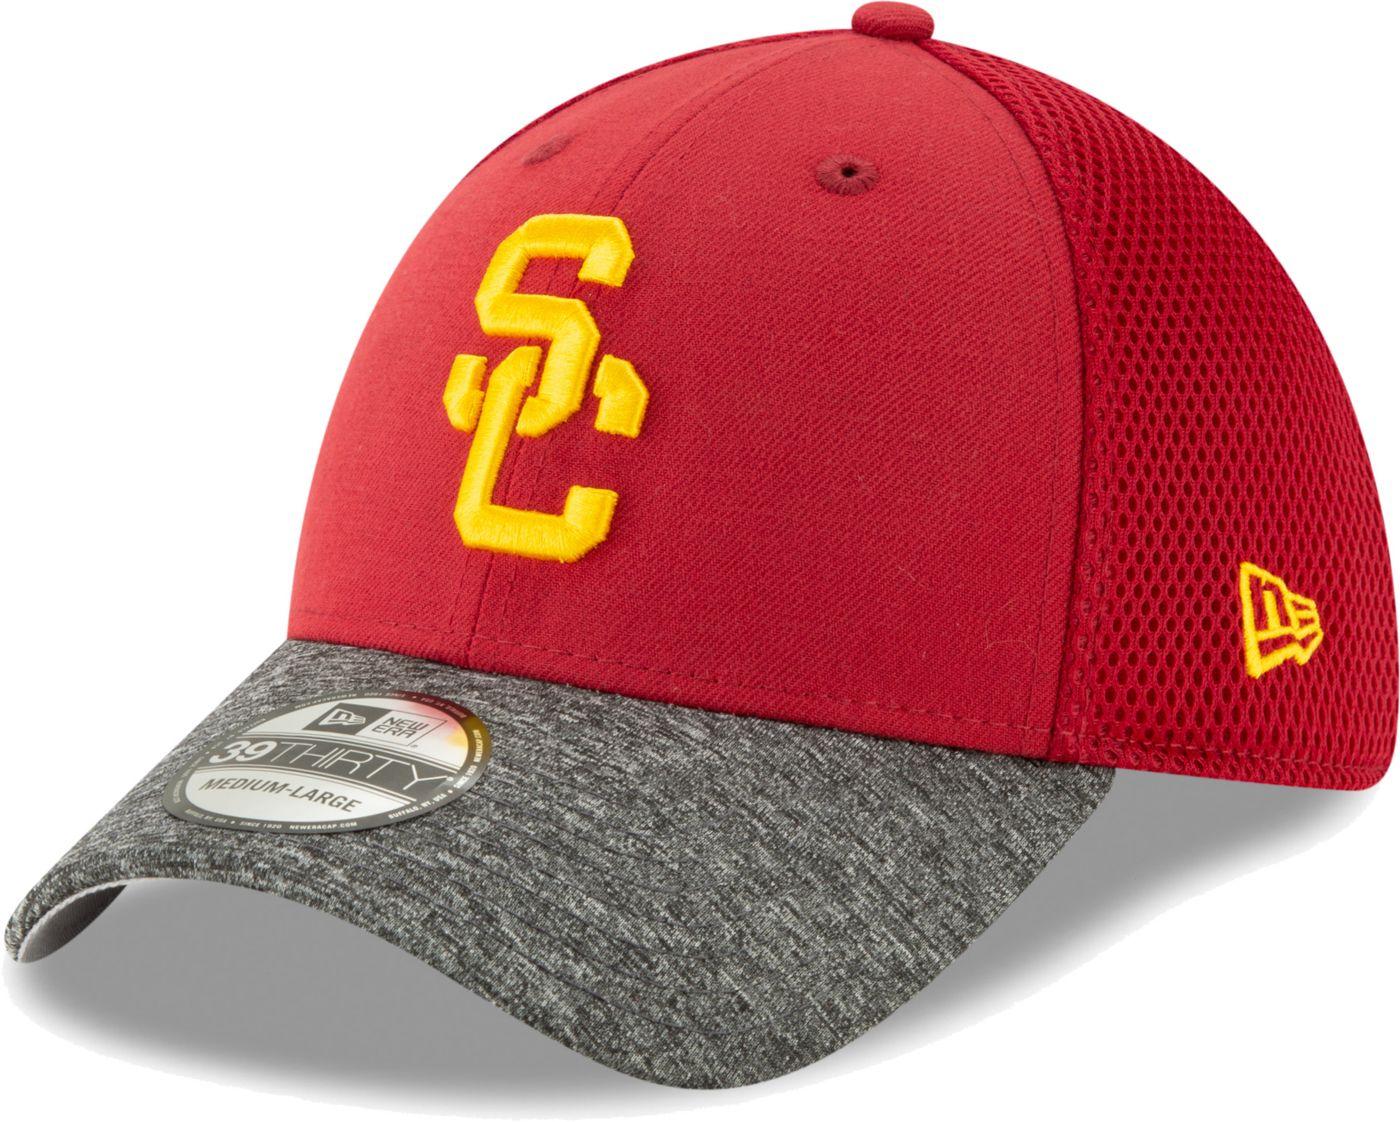 New Era Men's USC Trojans Cardinal Structured Adjustable Hat